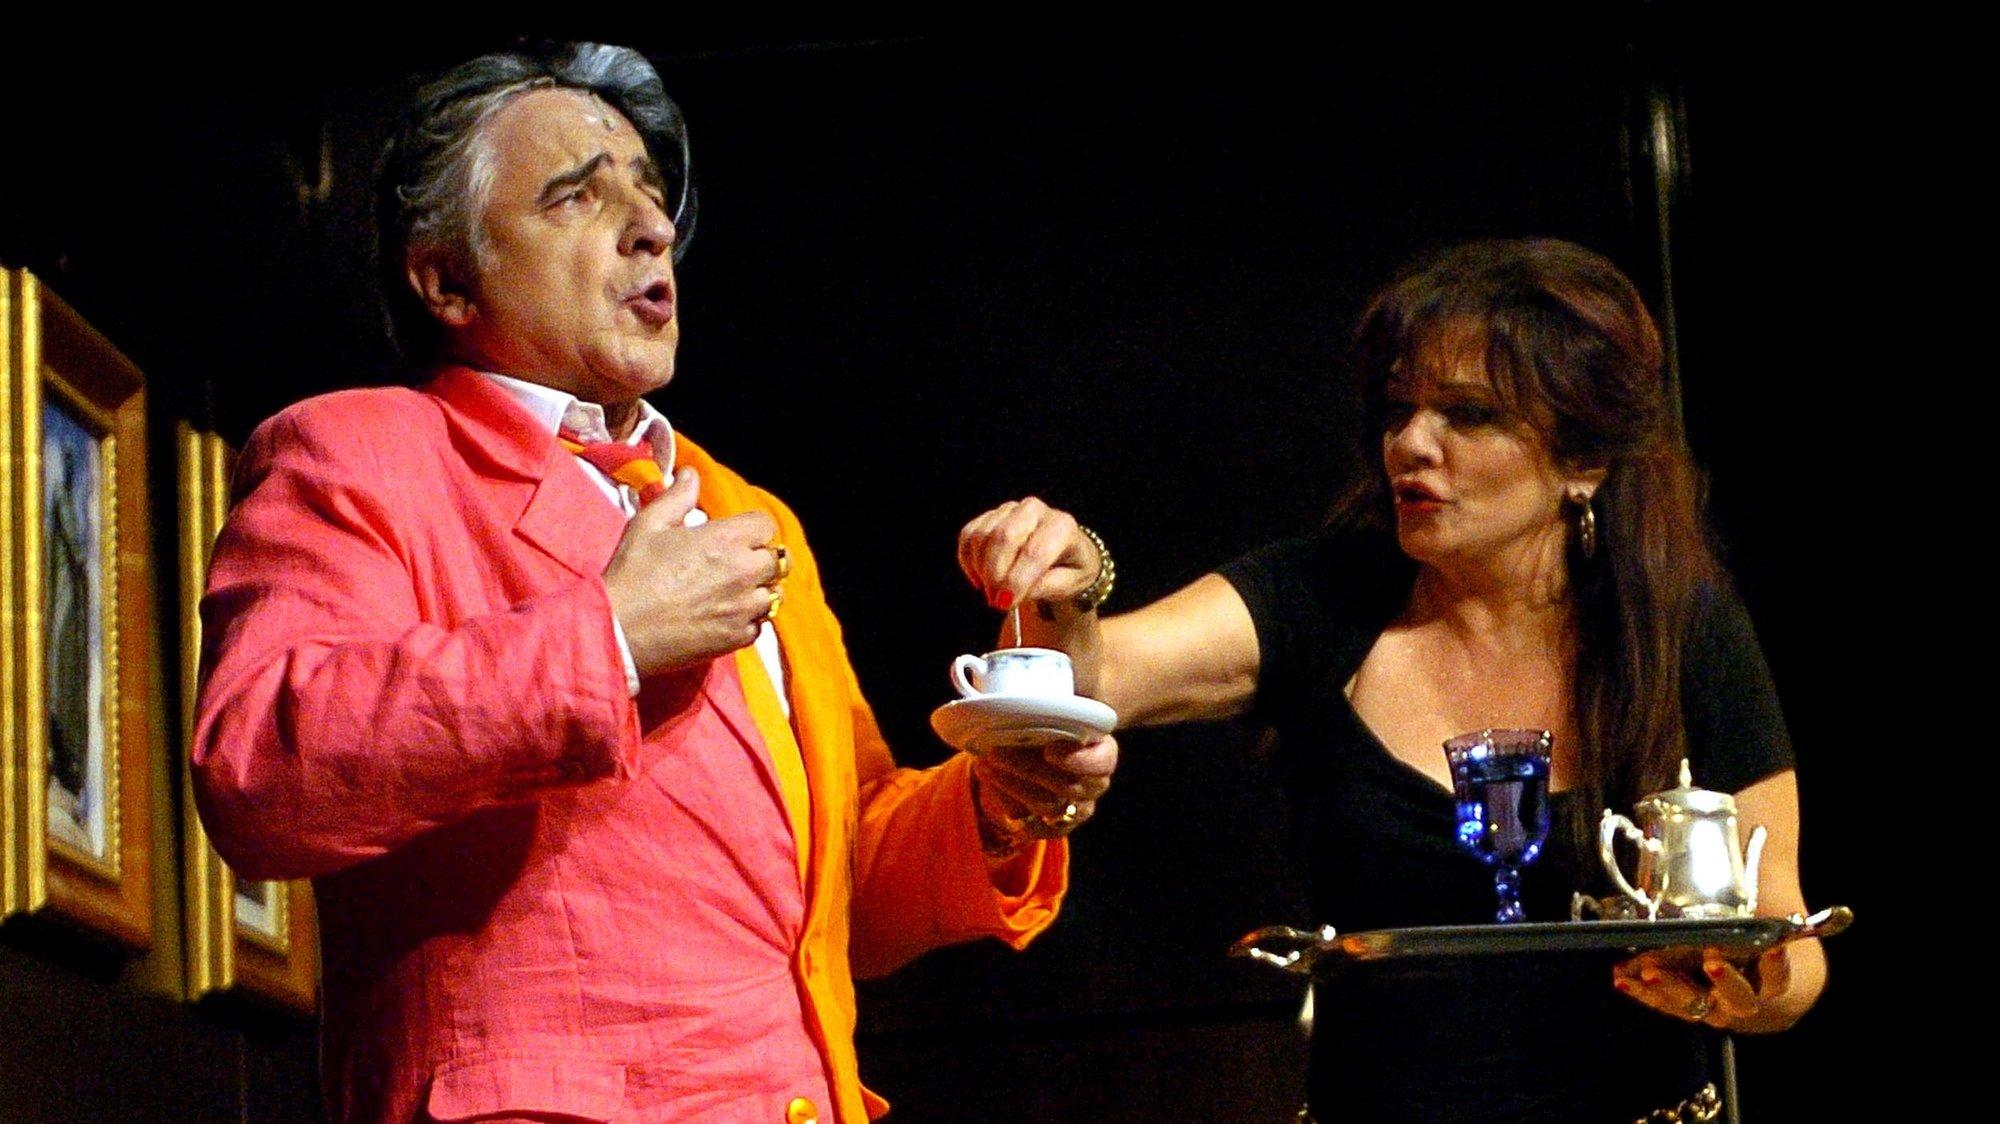 "Igor Sampaio e Rita Ribeiro durante a comédia musical ""Marquês de Pombal"" da autoria de Francisco Moita Flores no Teatro Independente de Oeiras, 16 de Junho de 2007. (ACOMPANHA TEXTO). MANUEL DE ALMEIDA / LUSA"